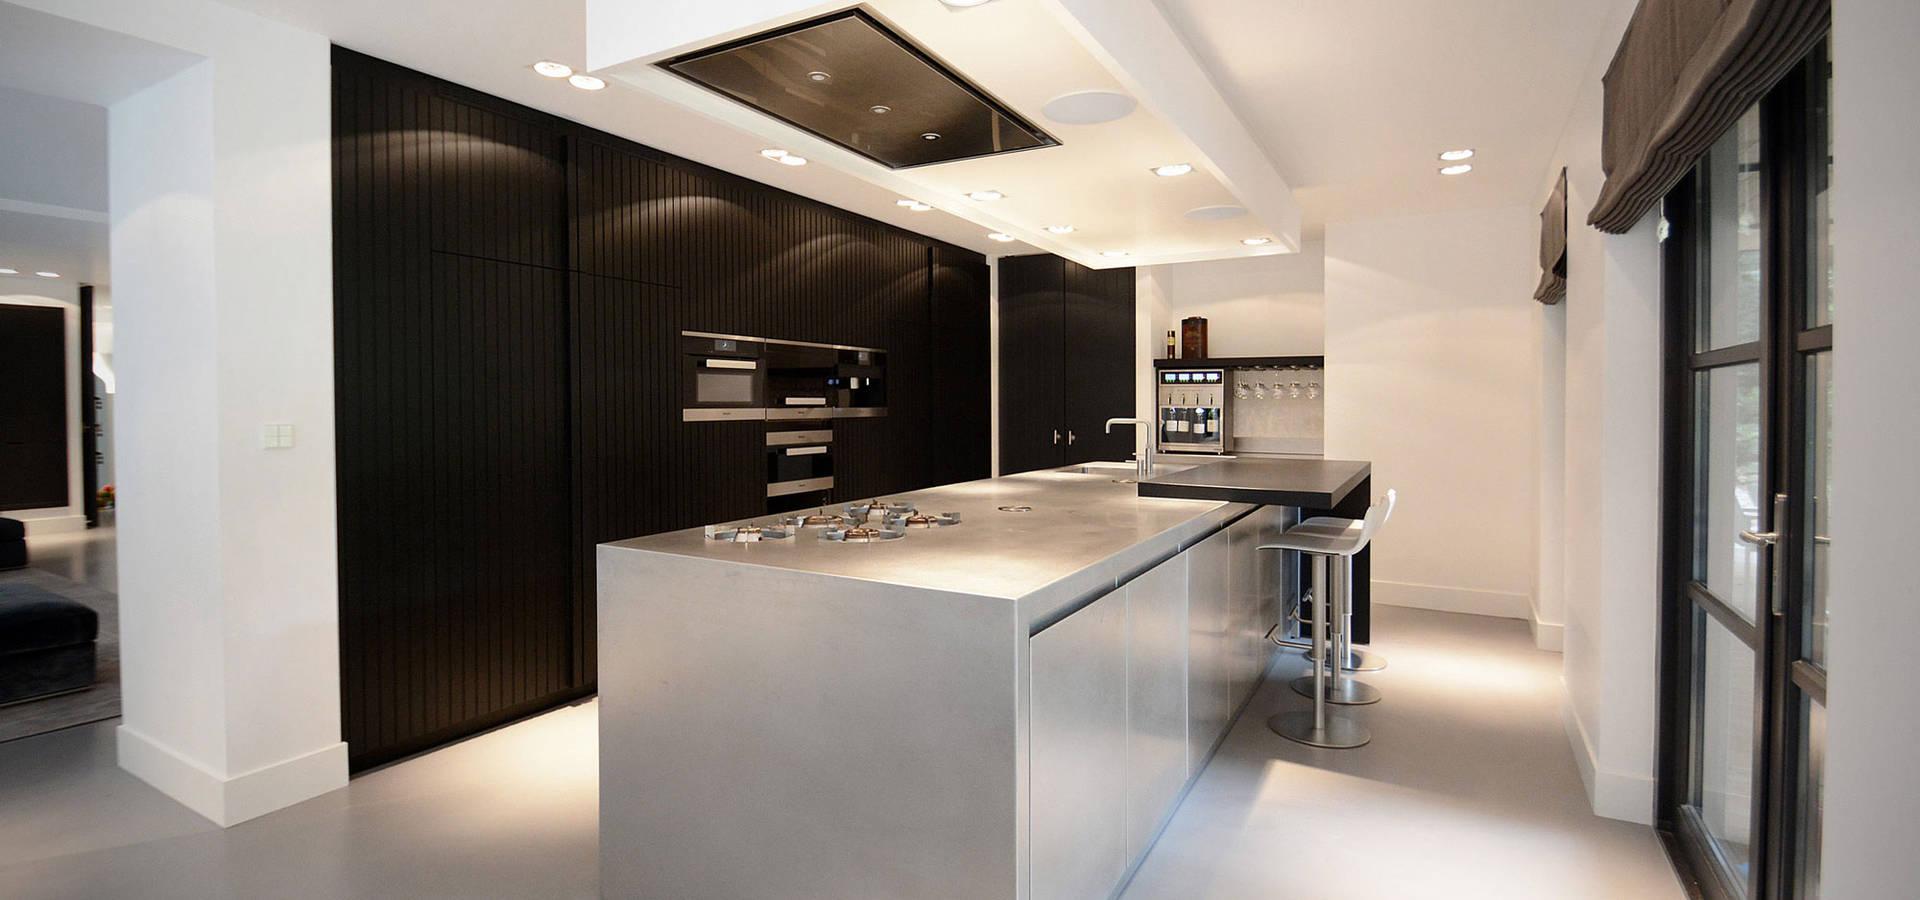 Ecker Keukens en Interieur